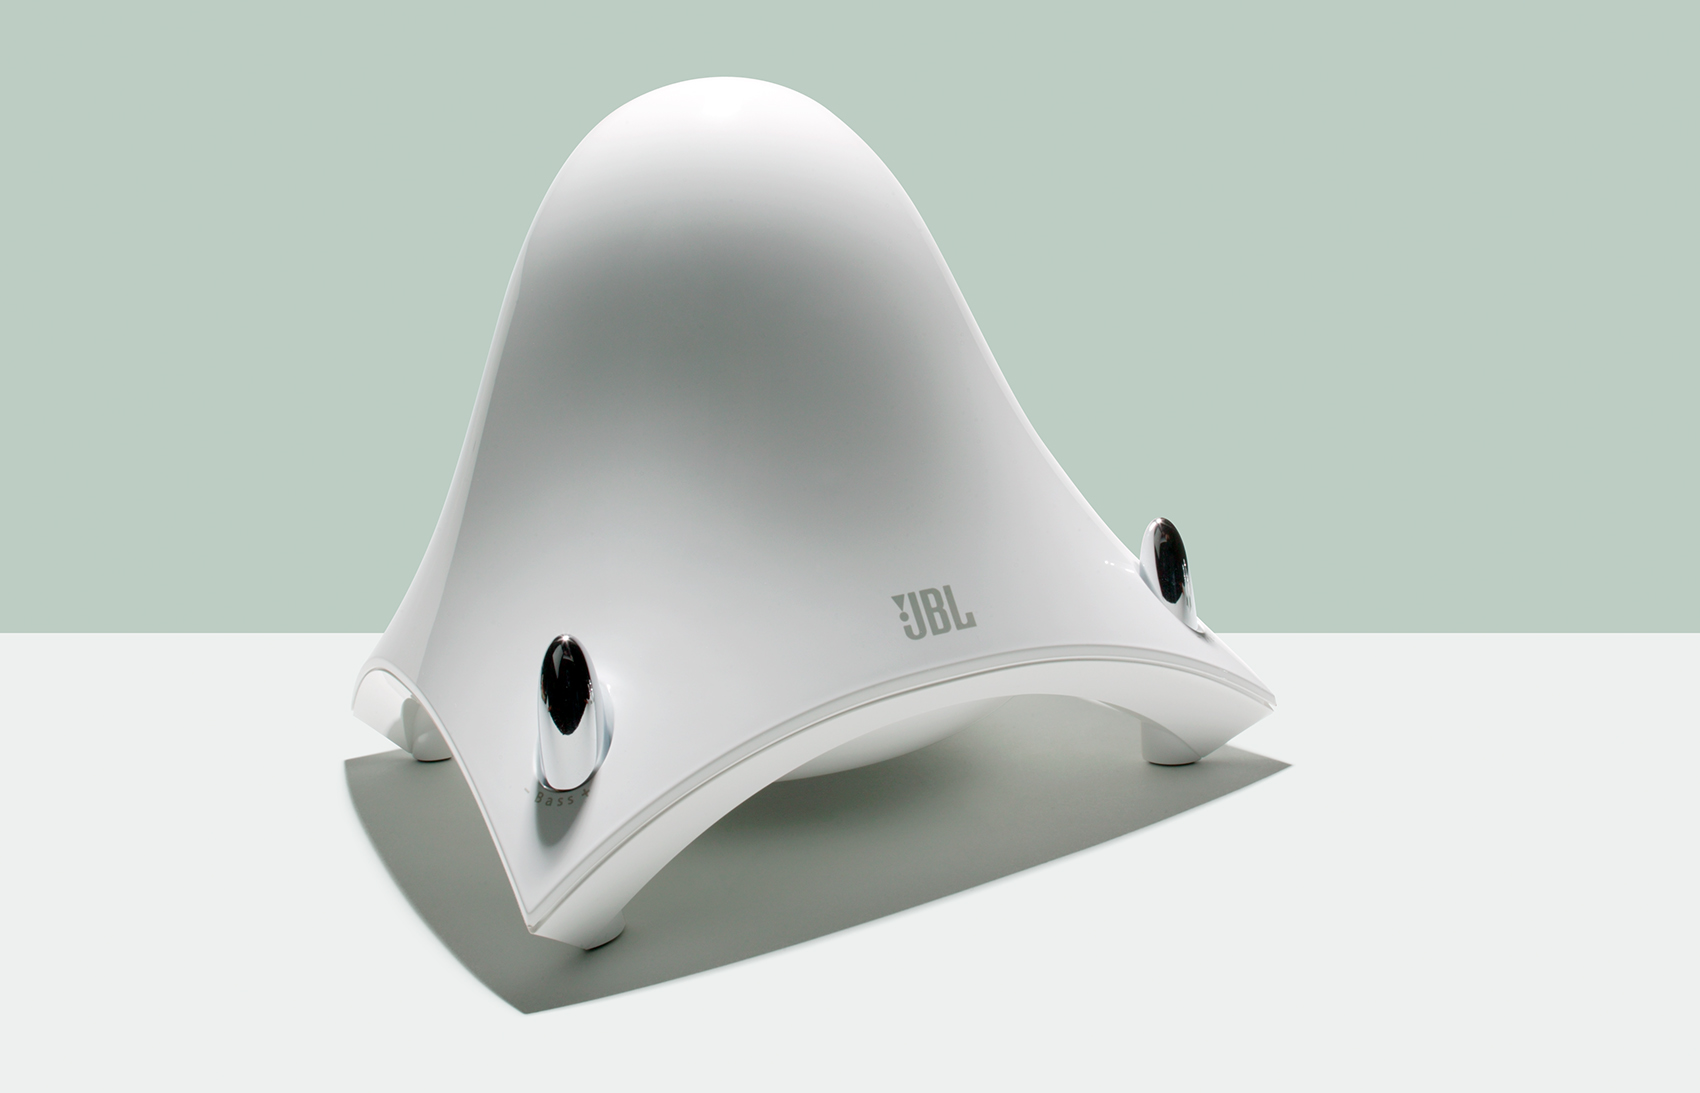 beautiful tech product studio photo of JBL Speaker Subwoofer